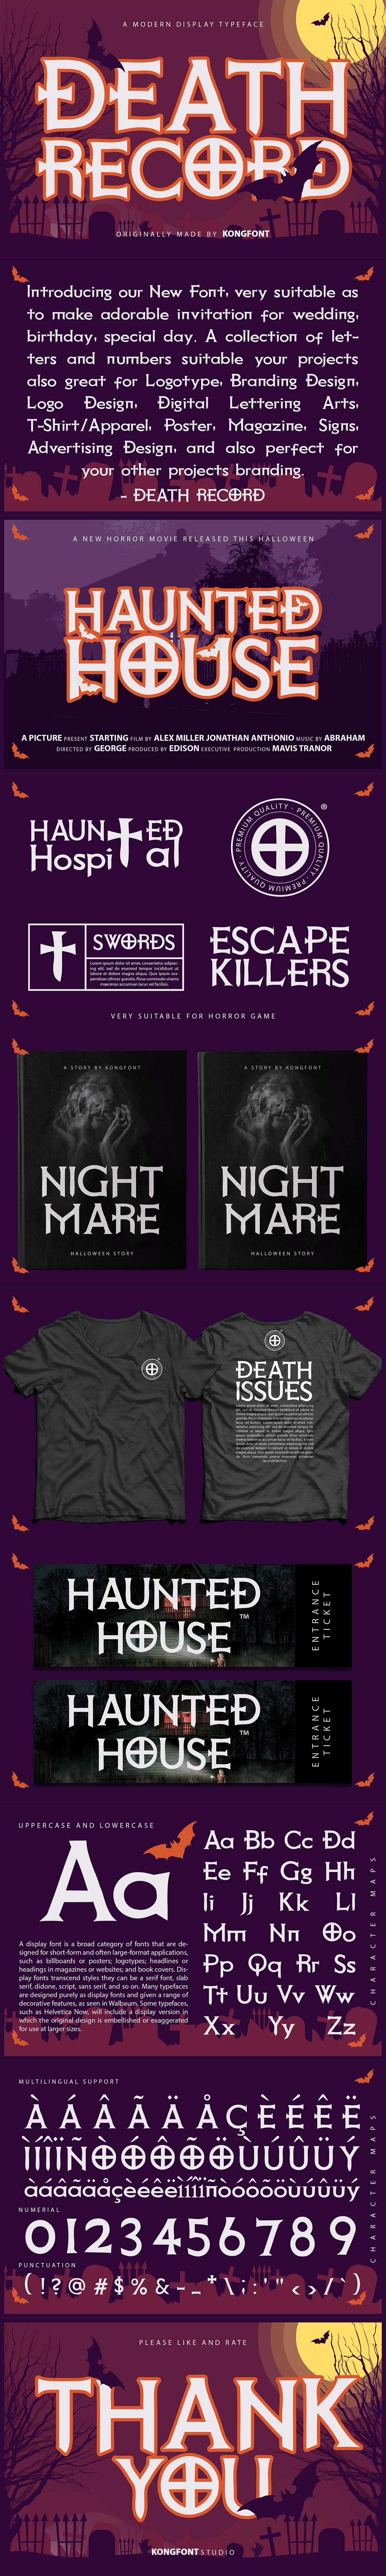 branding  creepy death record decorative Display font italic Logotype oblique spooky